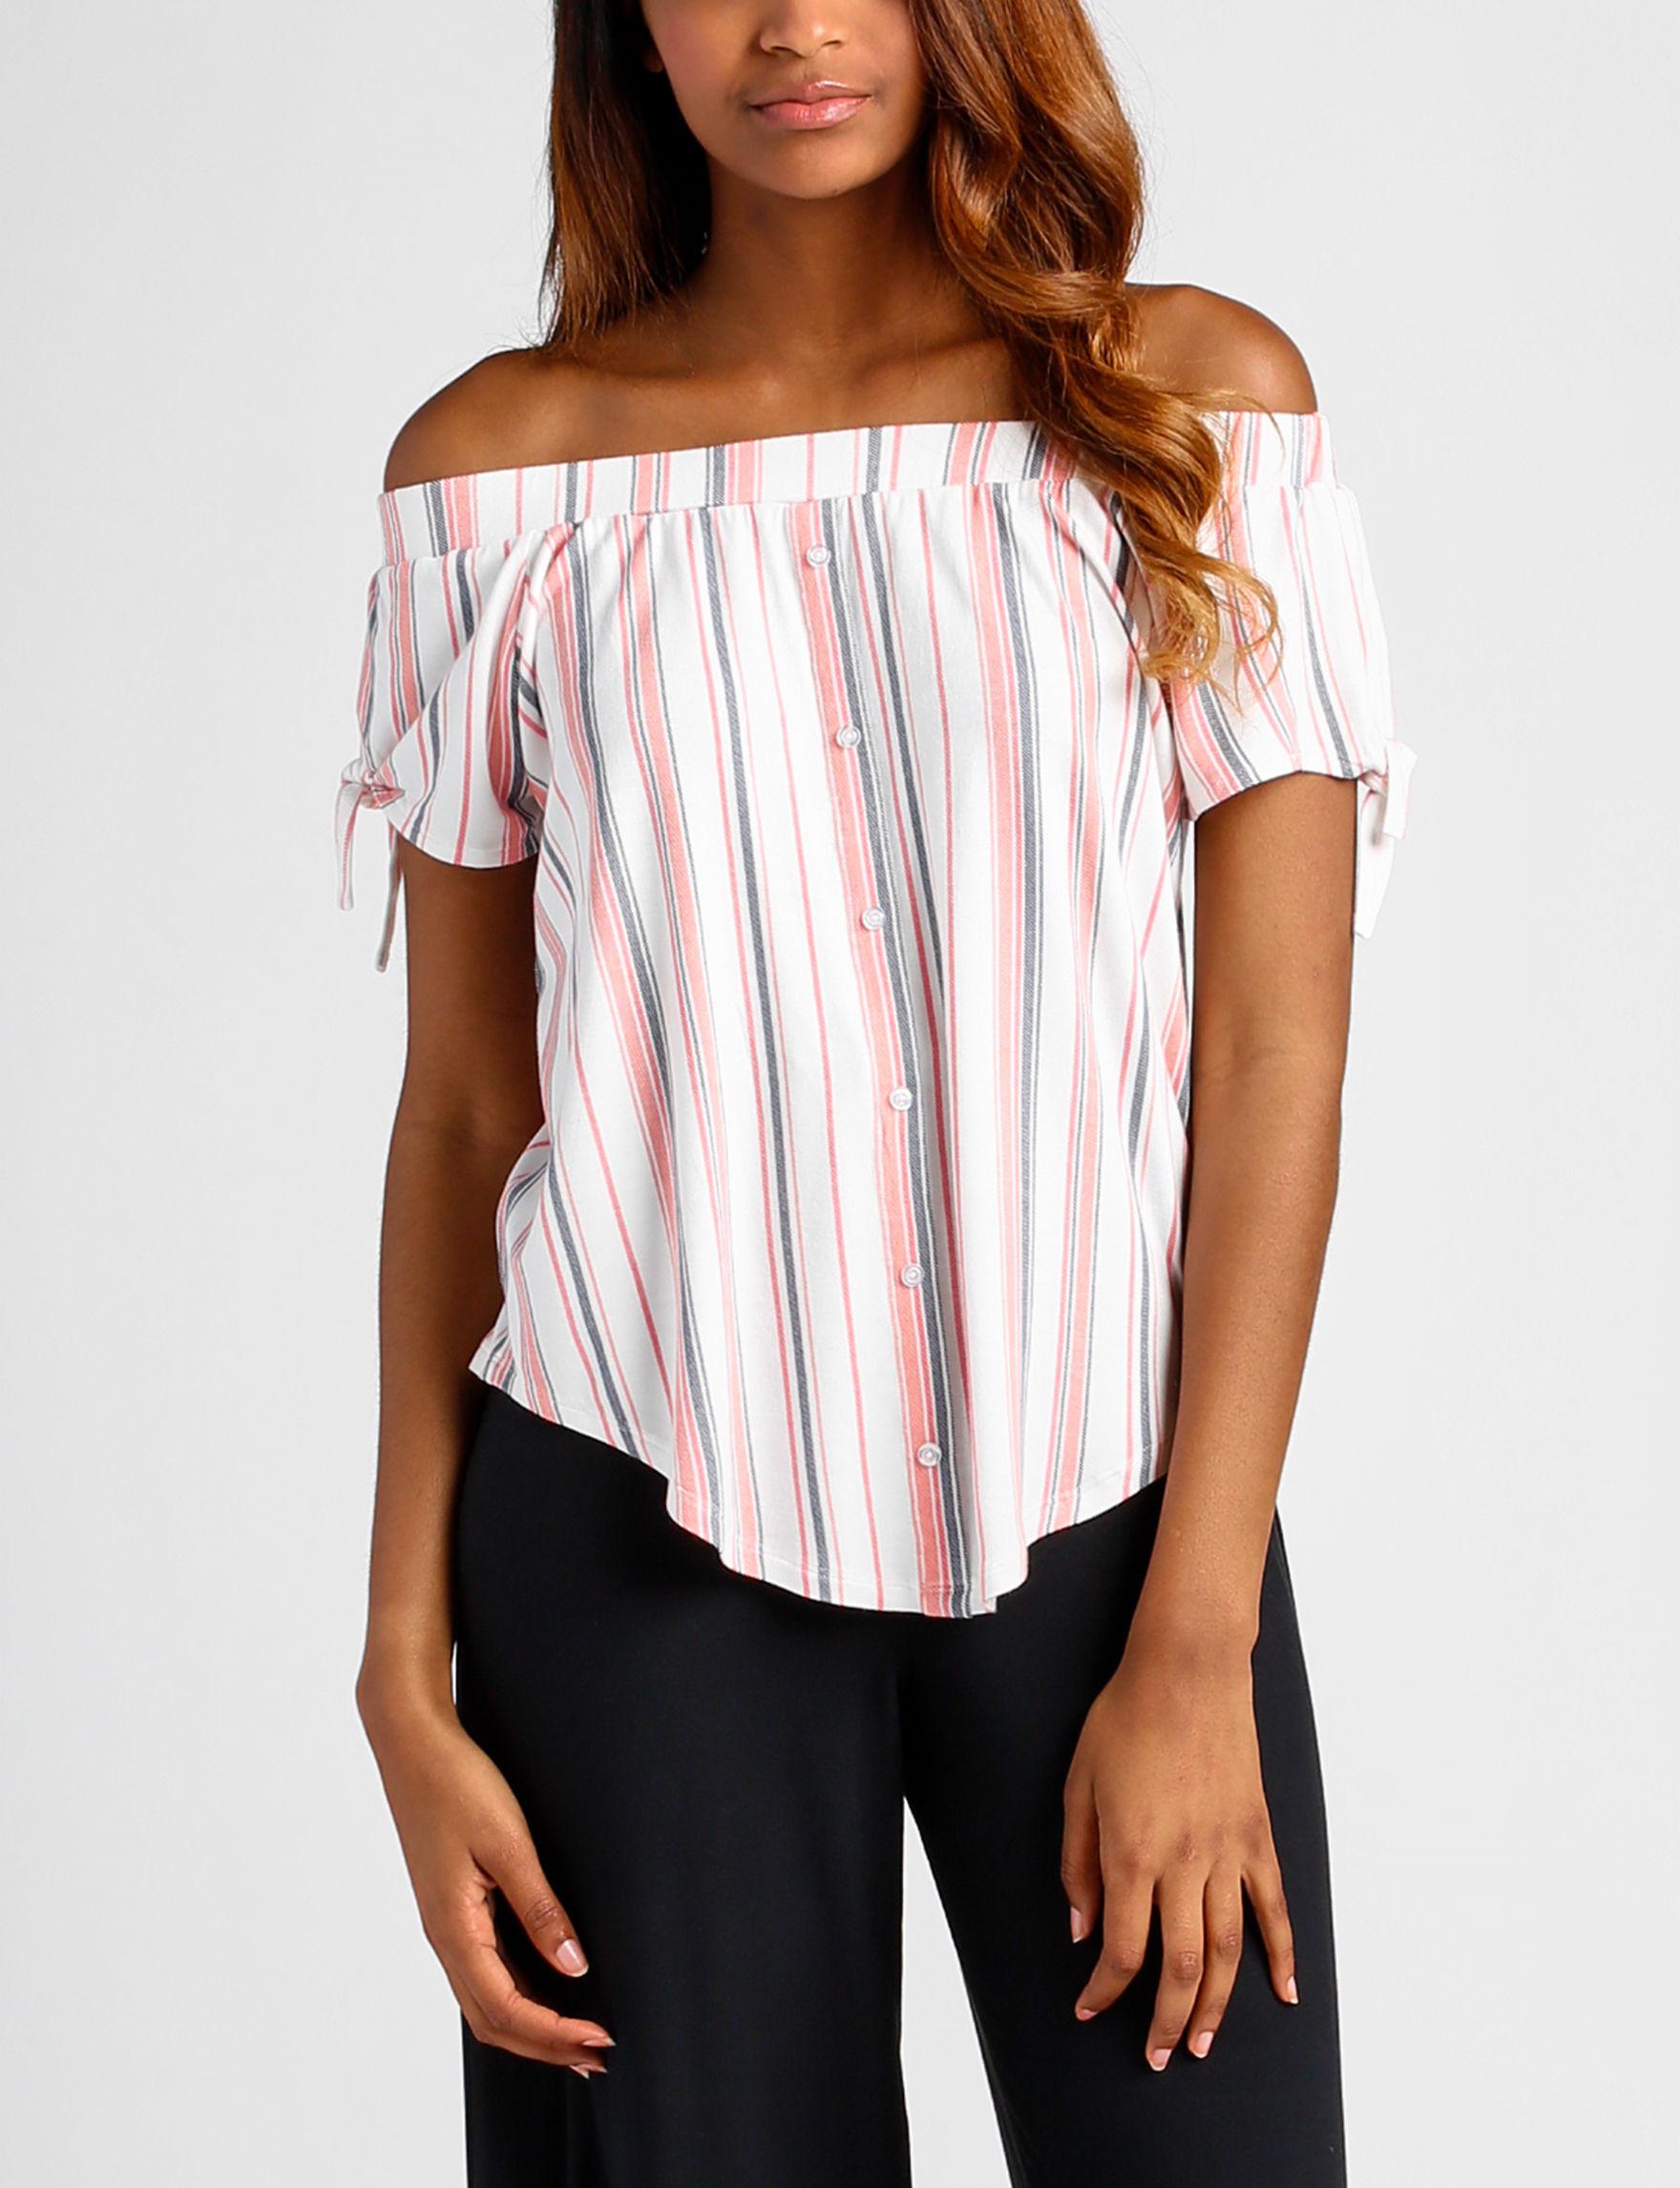 Ultra Flirt Coral Multi Shirts & Blouses